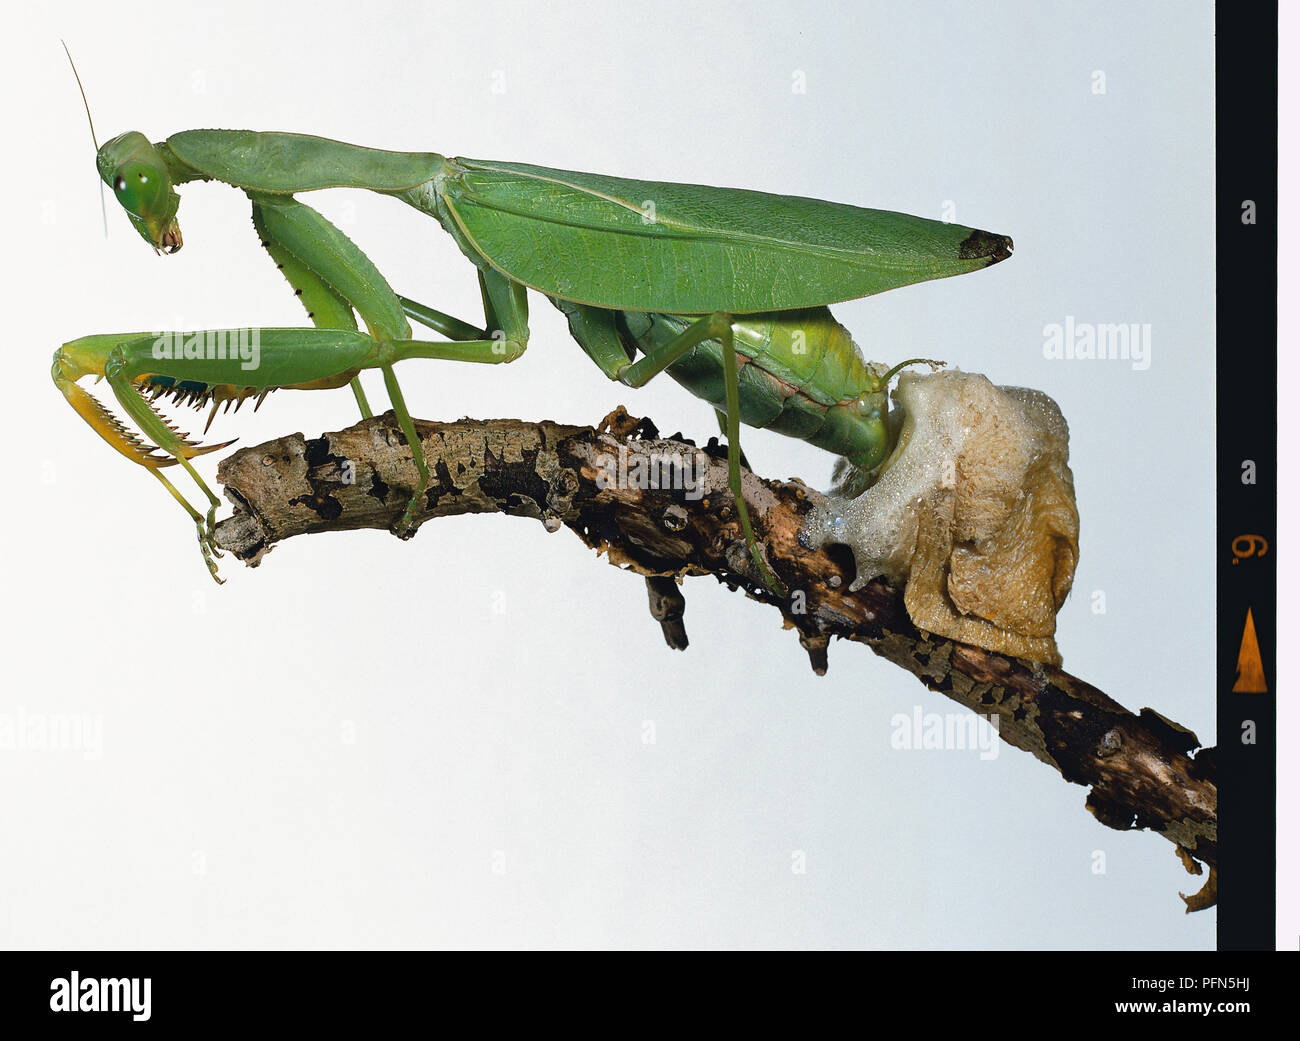 Praying Mantis Mantis Religiosa Laying Eggs Into Foamy Egg Case